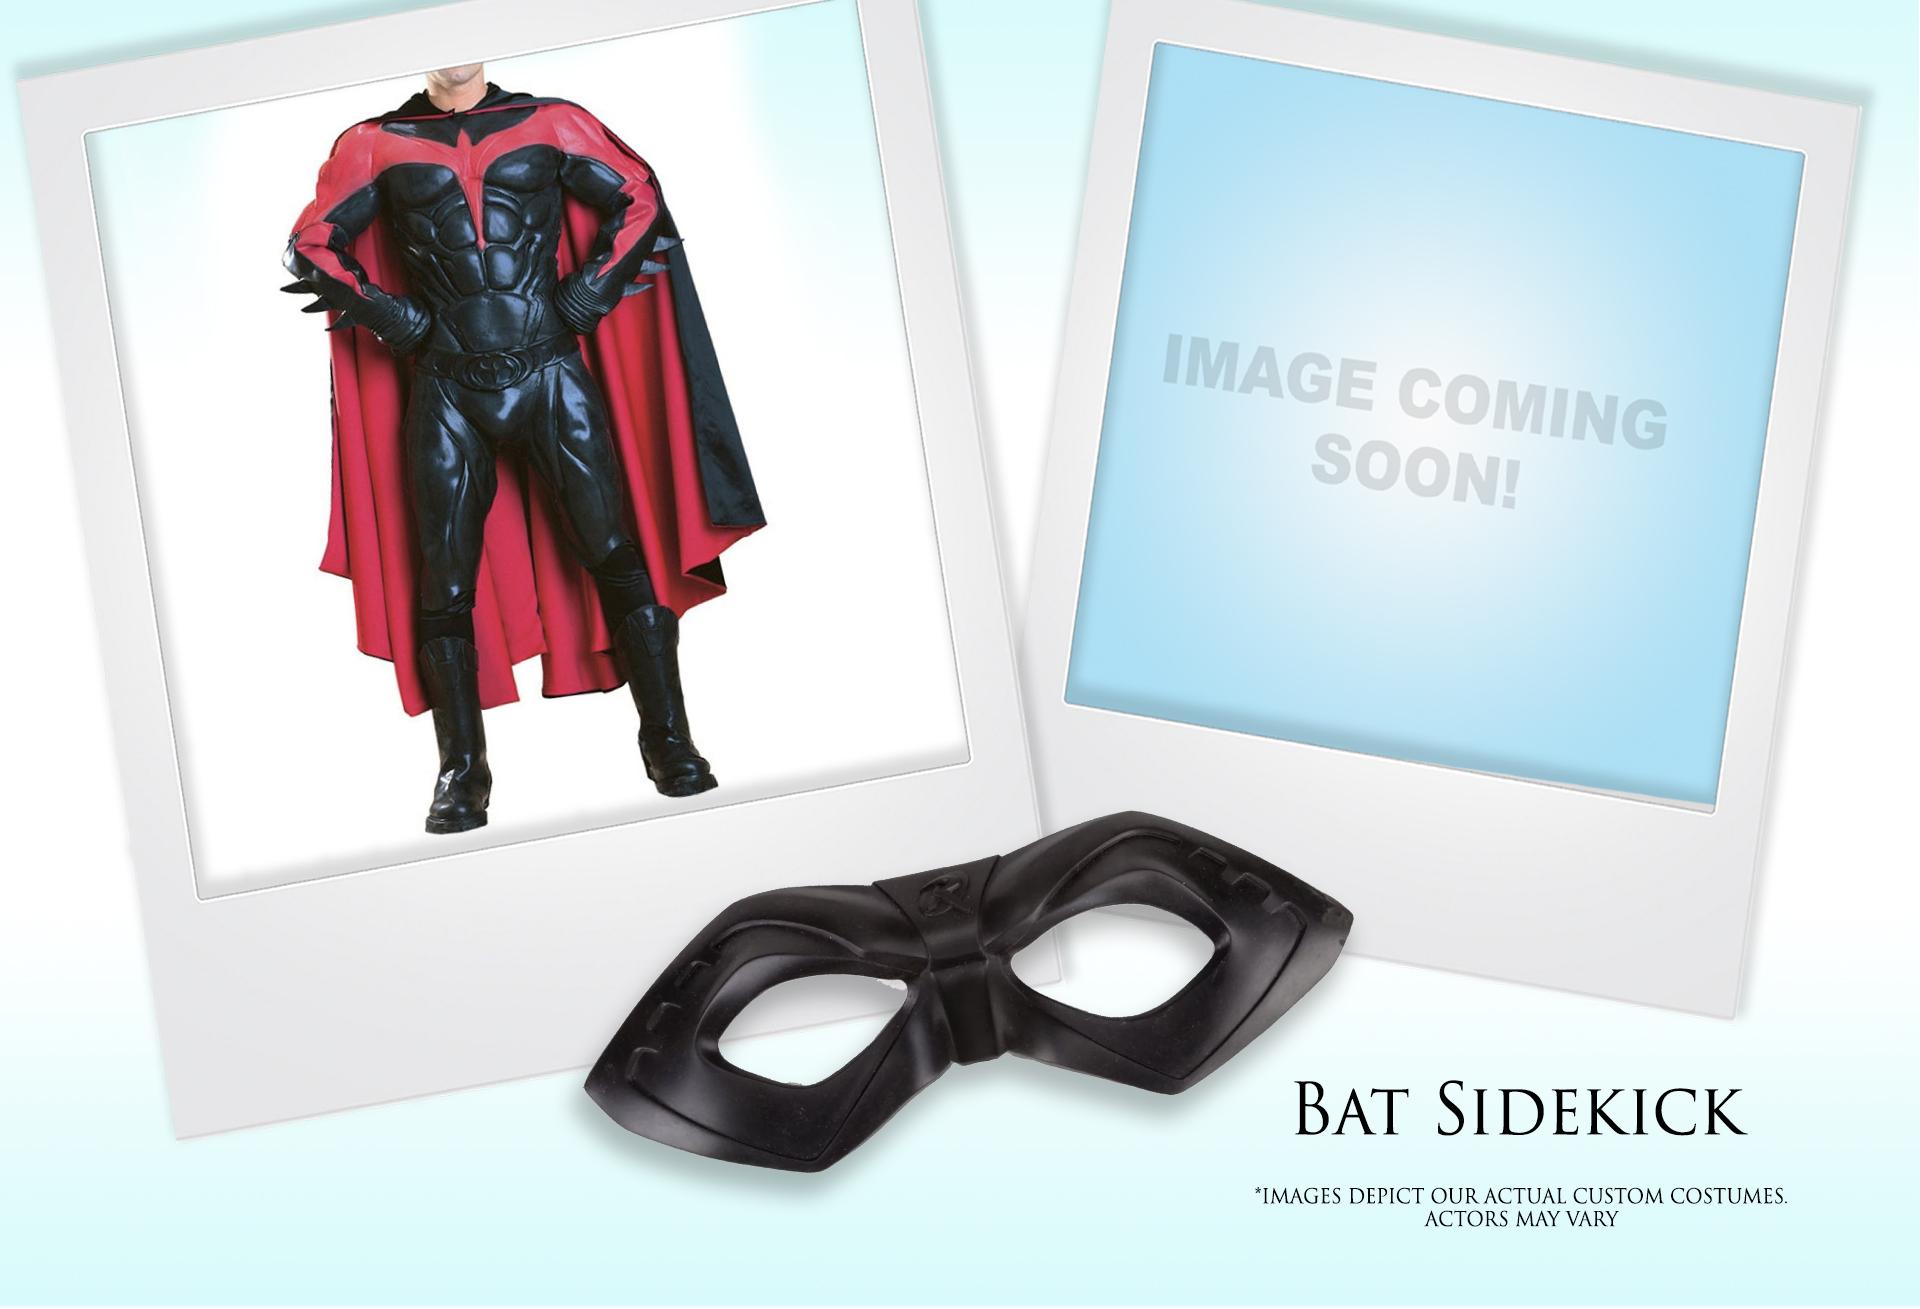 Bat Sidekick